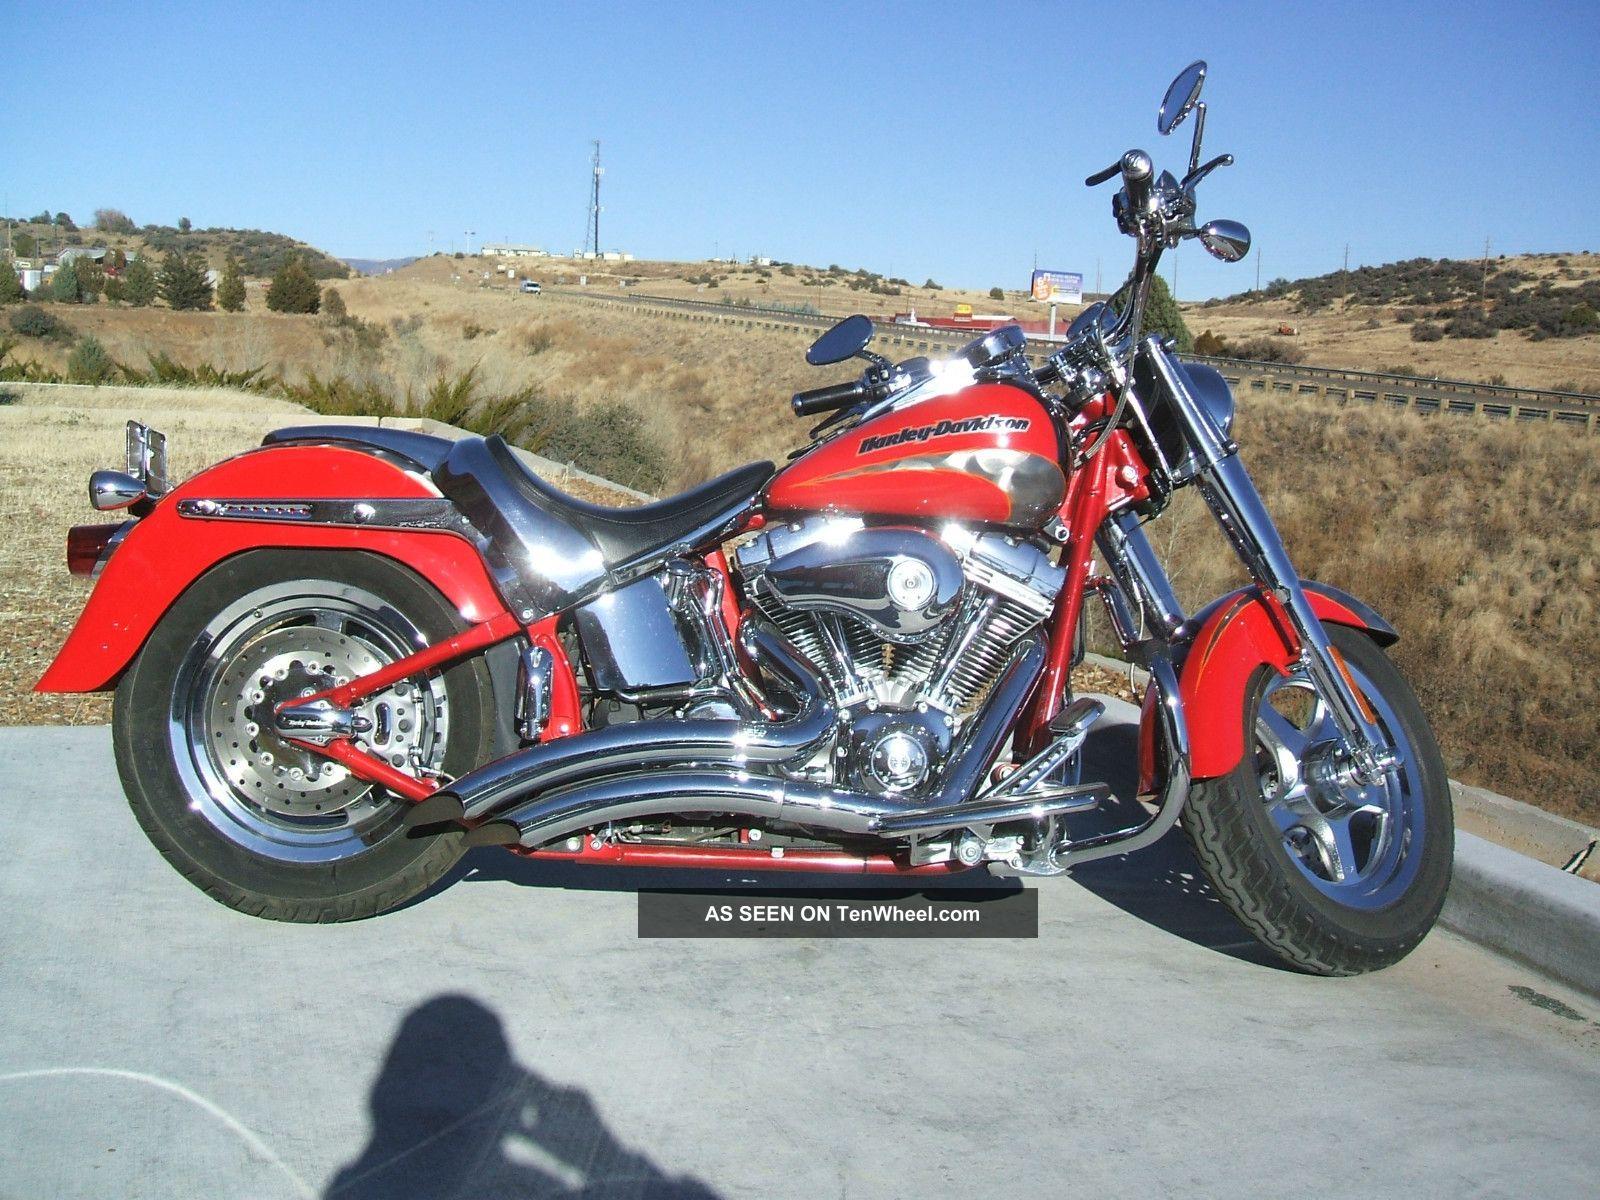 2015 Screaming Eagle Harley Davidson Catalog | Autos Post